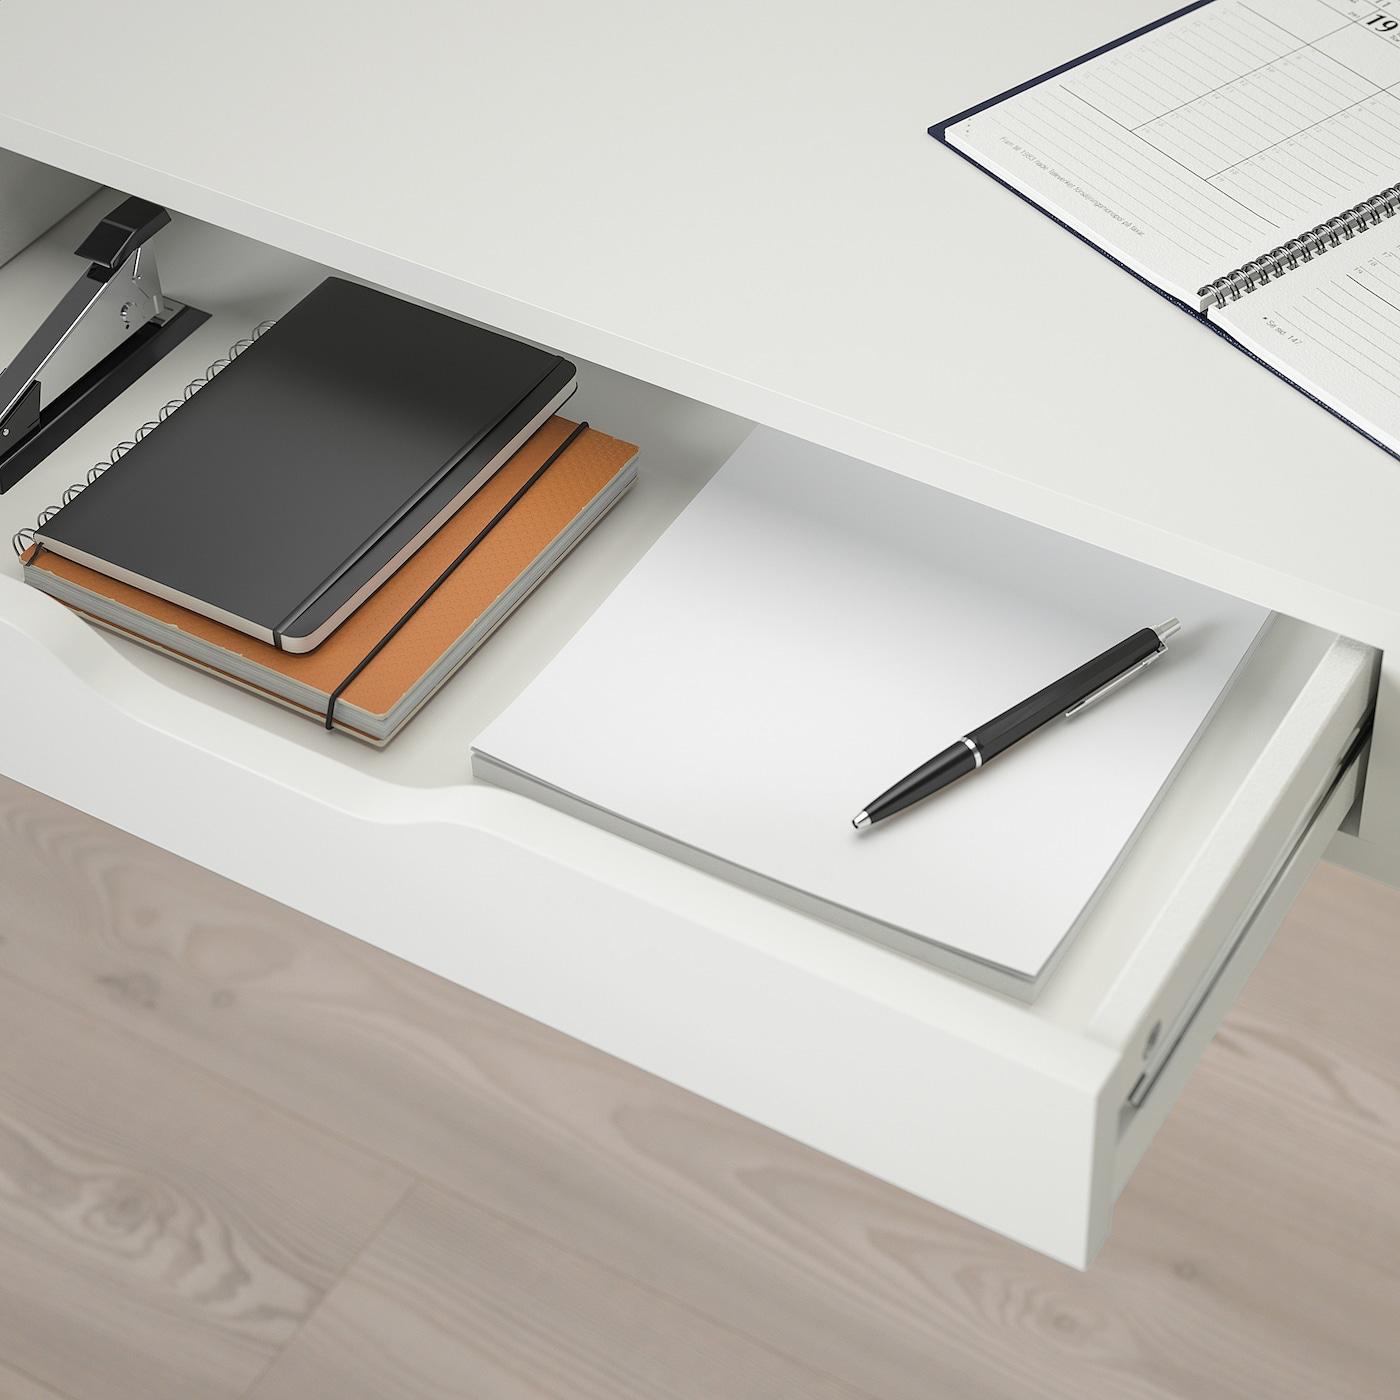 EKBY ALEX RAMSHULT Wandregal weißweiß IKEA Österreich